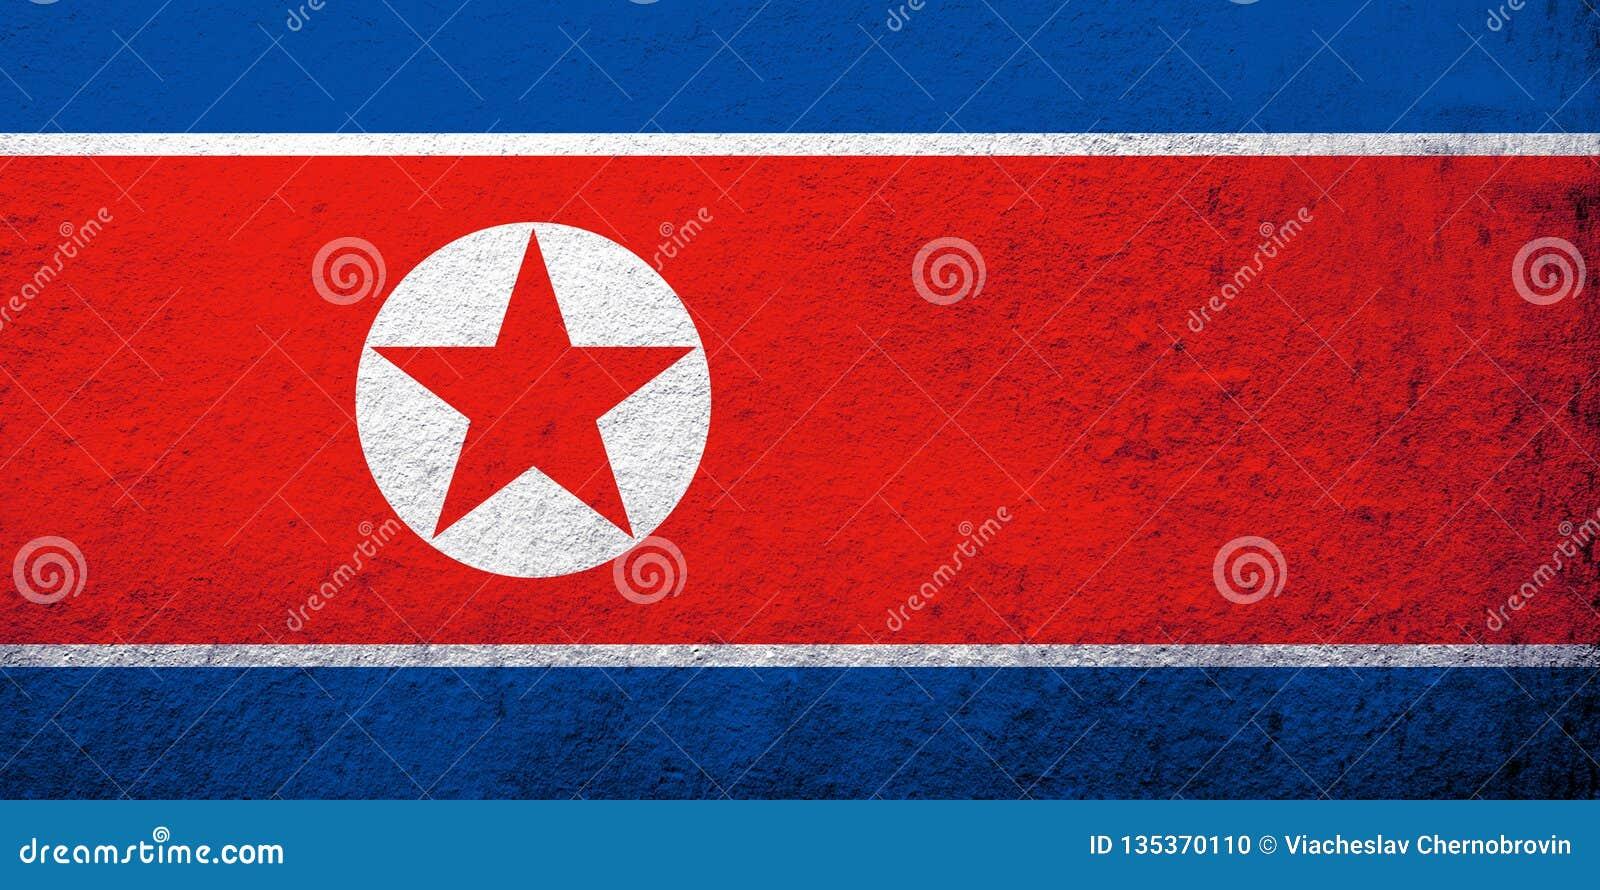 共和国 主義 朝鮮 民主 人民